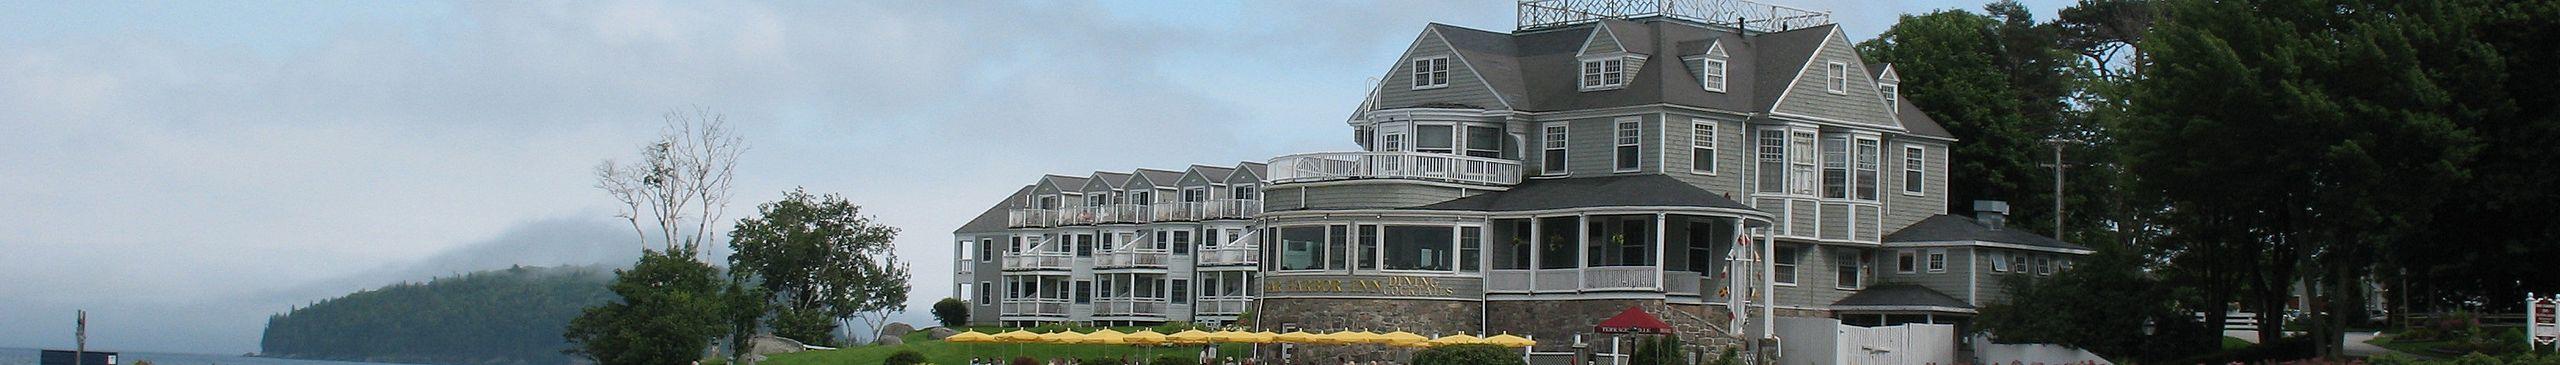 Bangor Maine Bed And Breakfast Inns